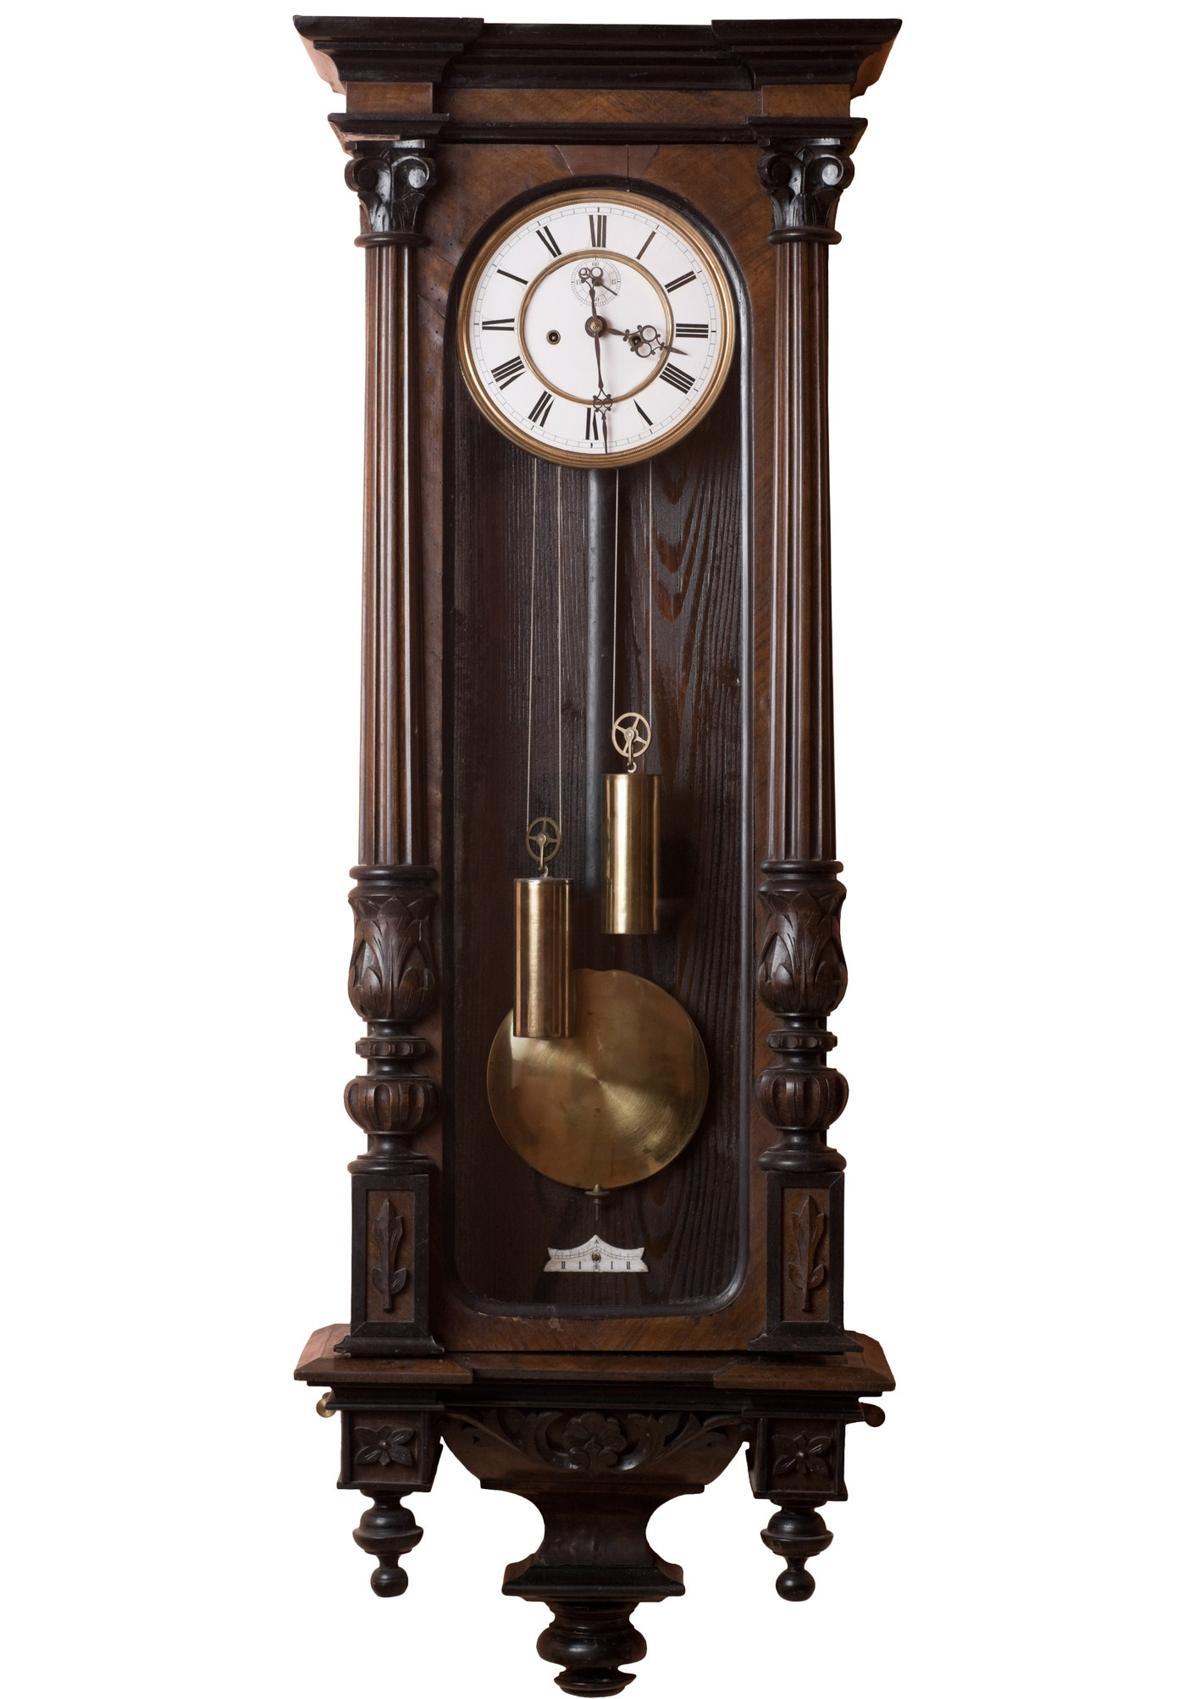 How Do Pendulum Clocks Work